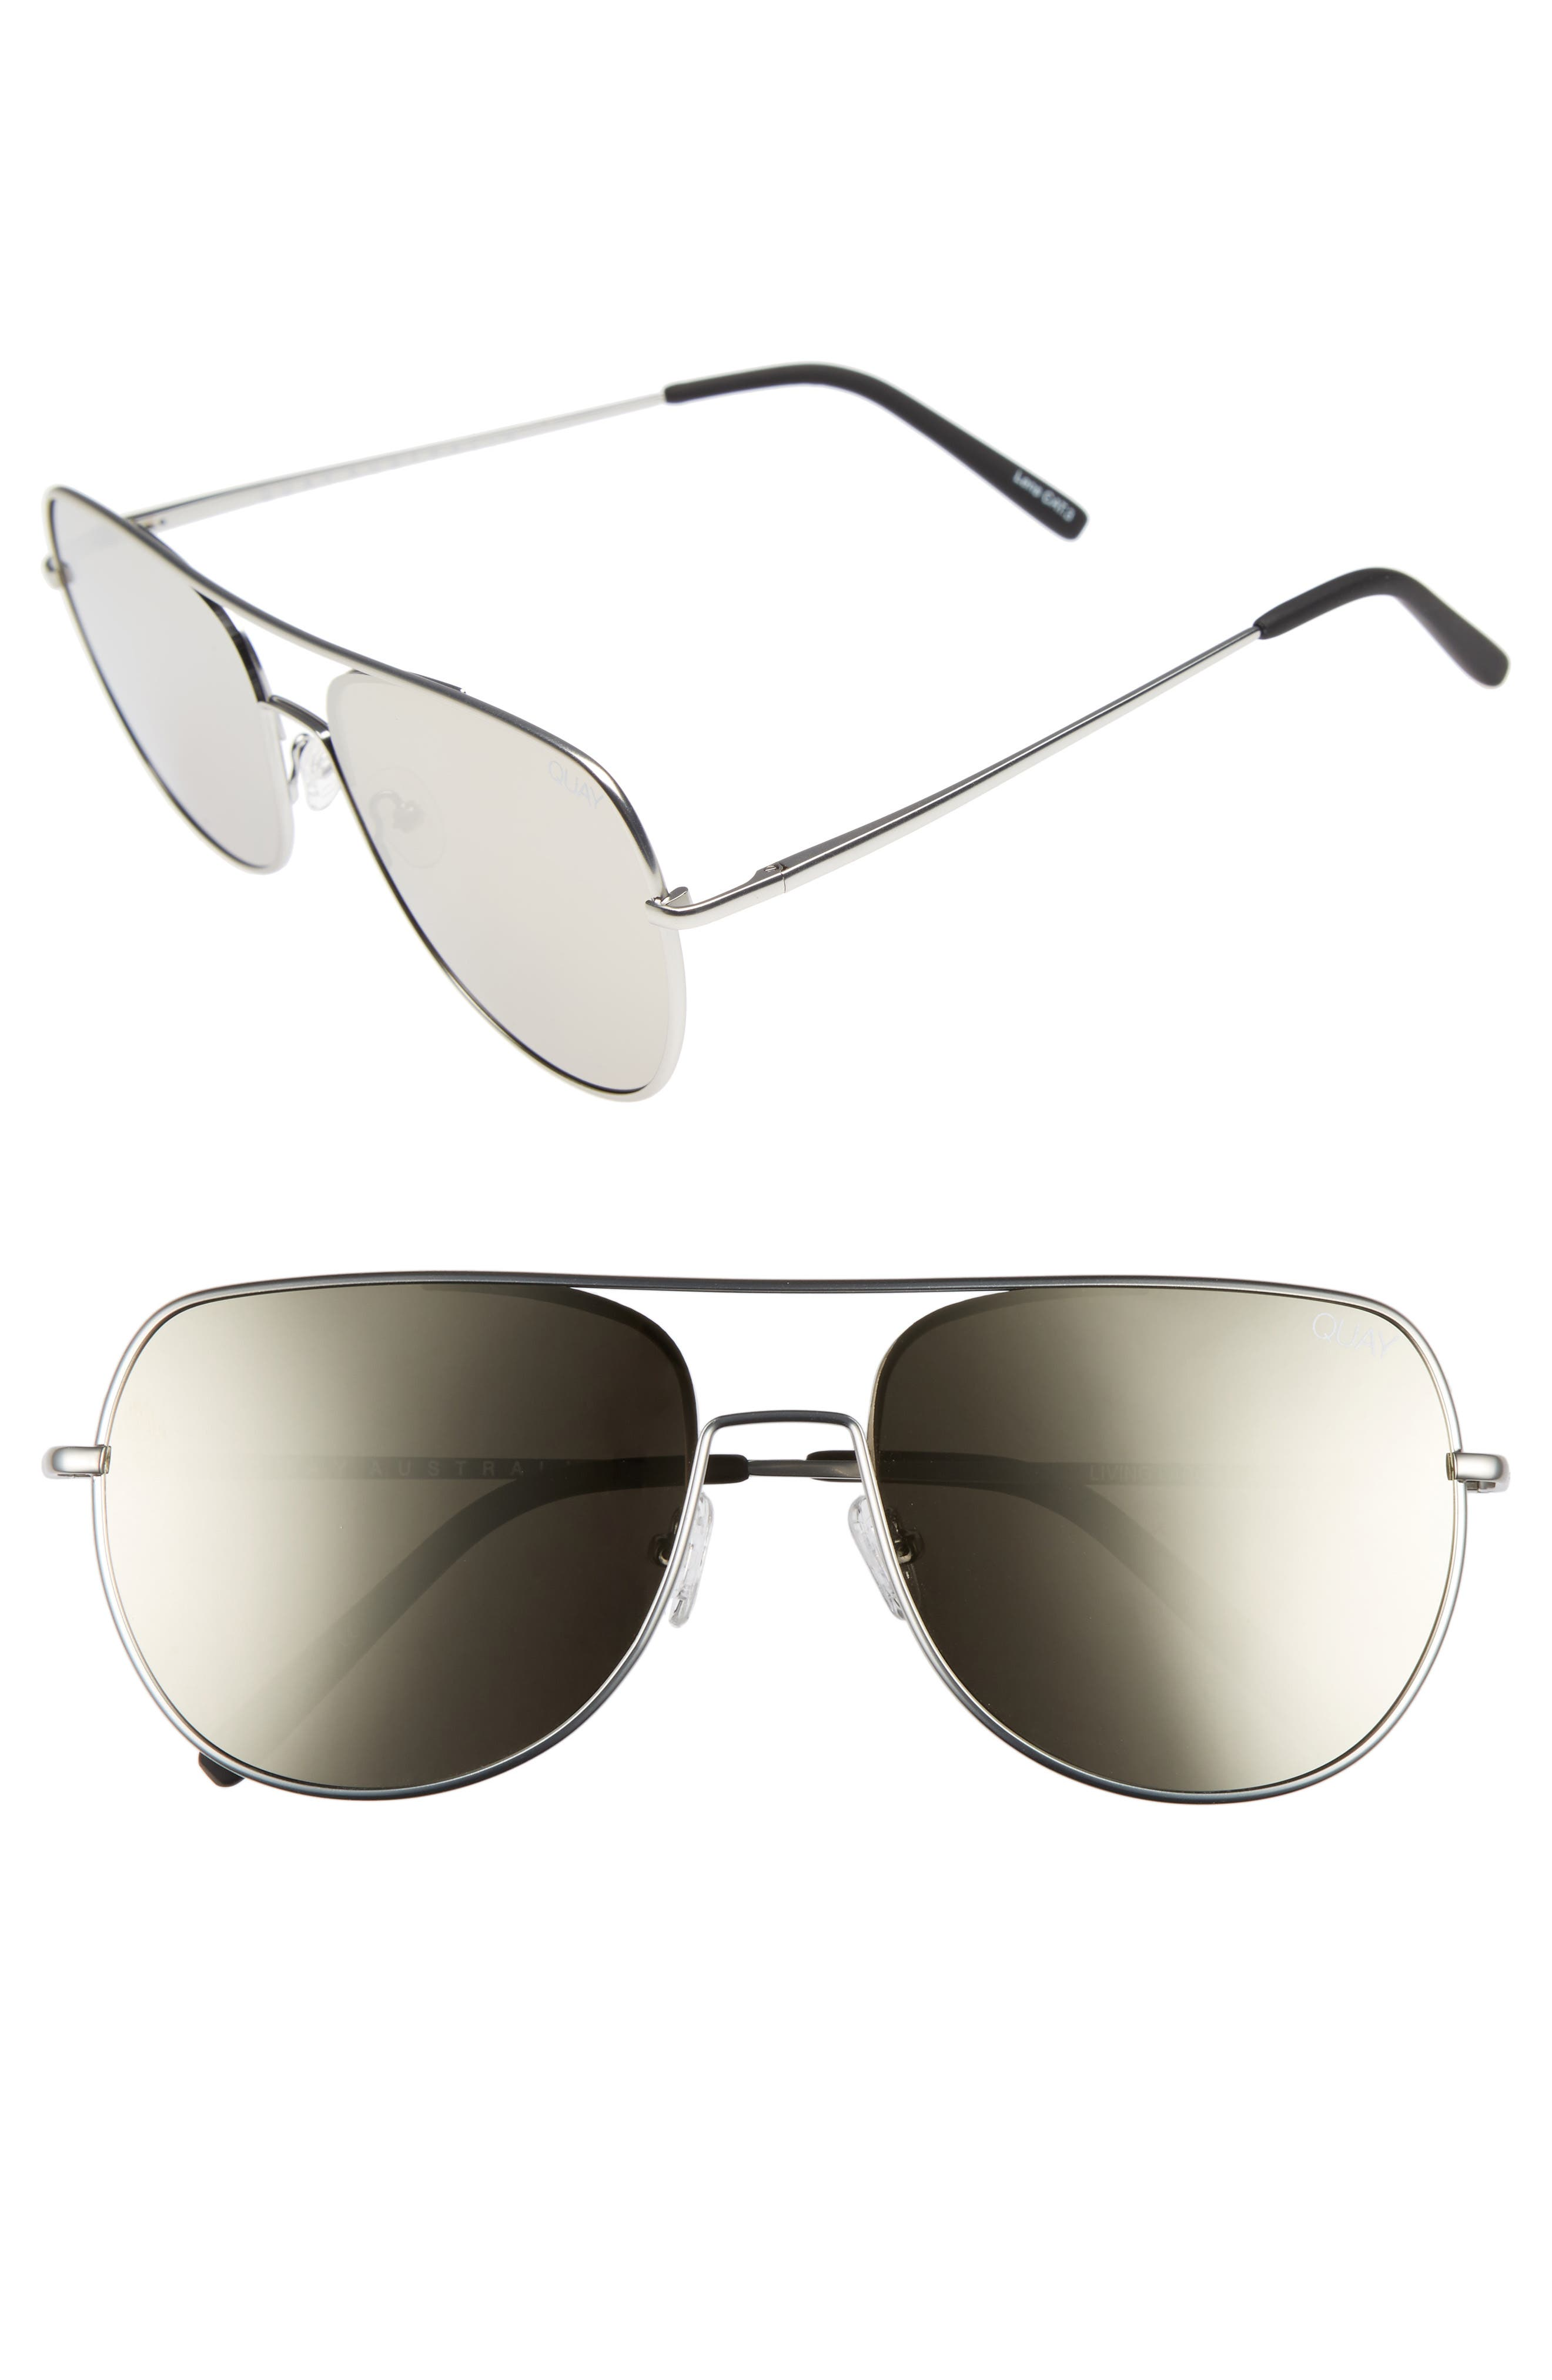 Living Large 61mm Aviator Sunglasses,                             Main thumbnail 1, color,                             Silver/ Silver